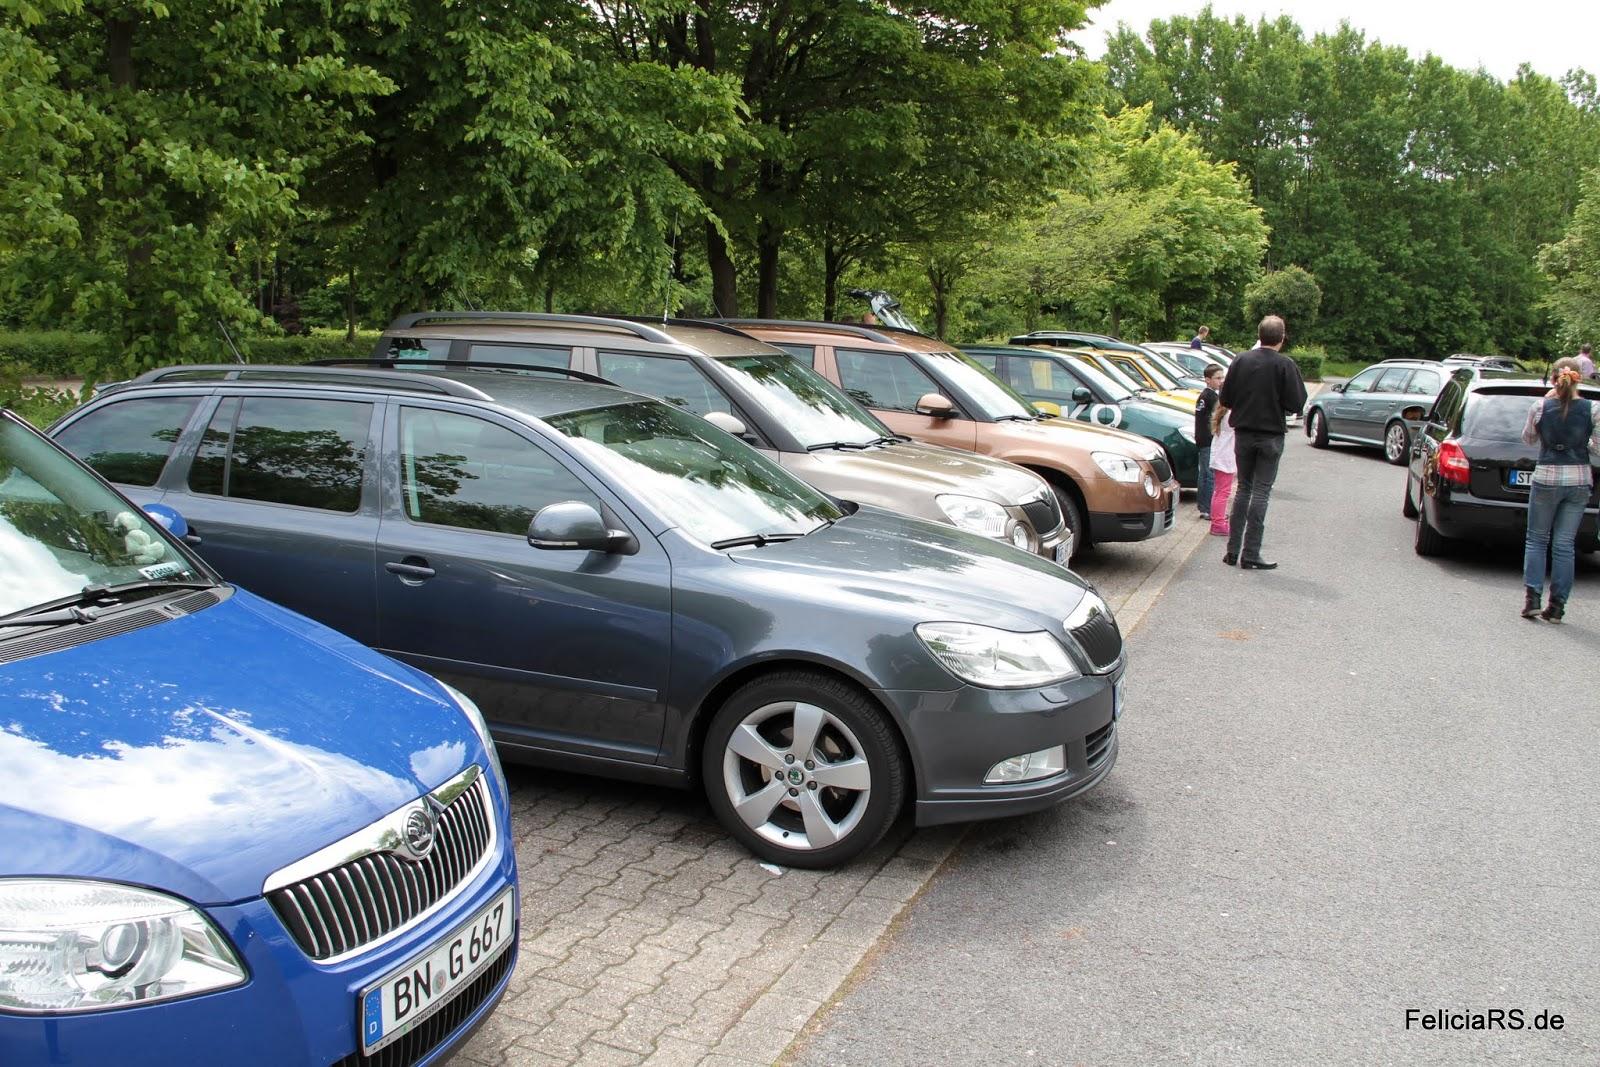 P+R Parkplatz Hemberg